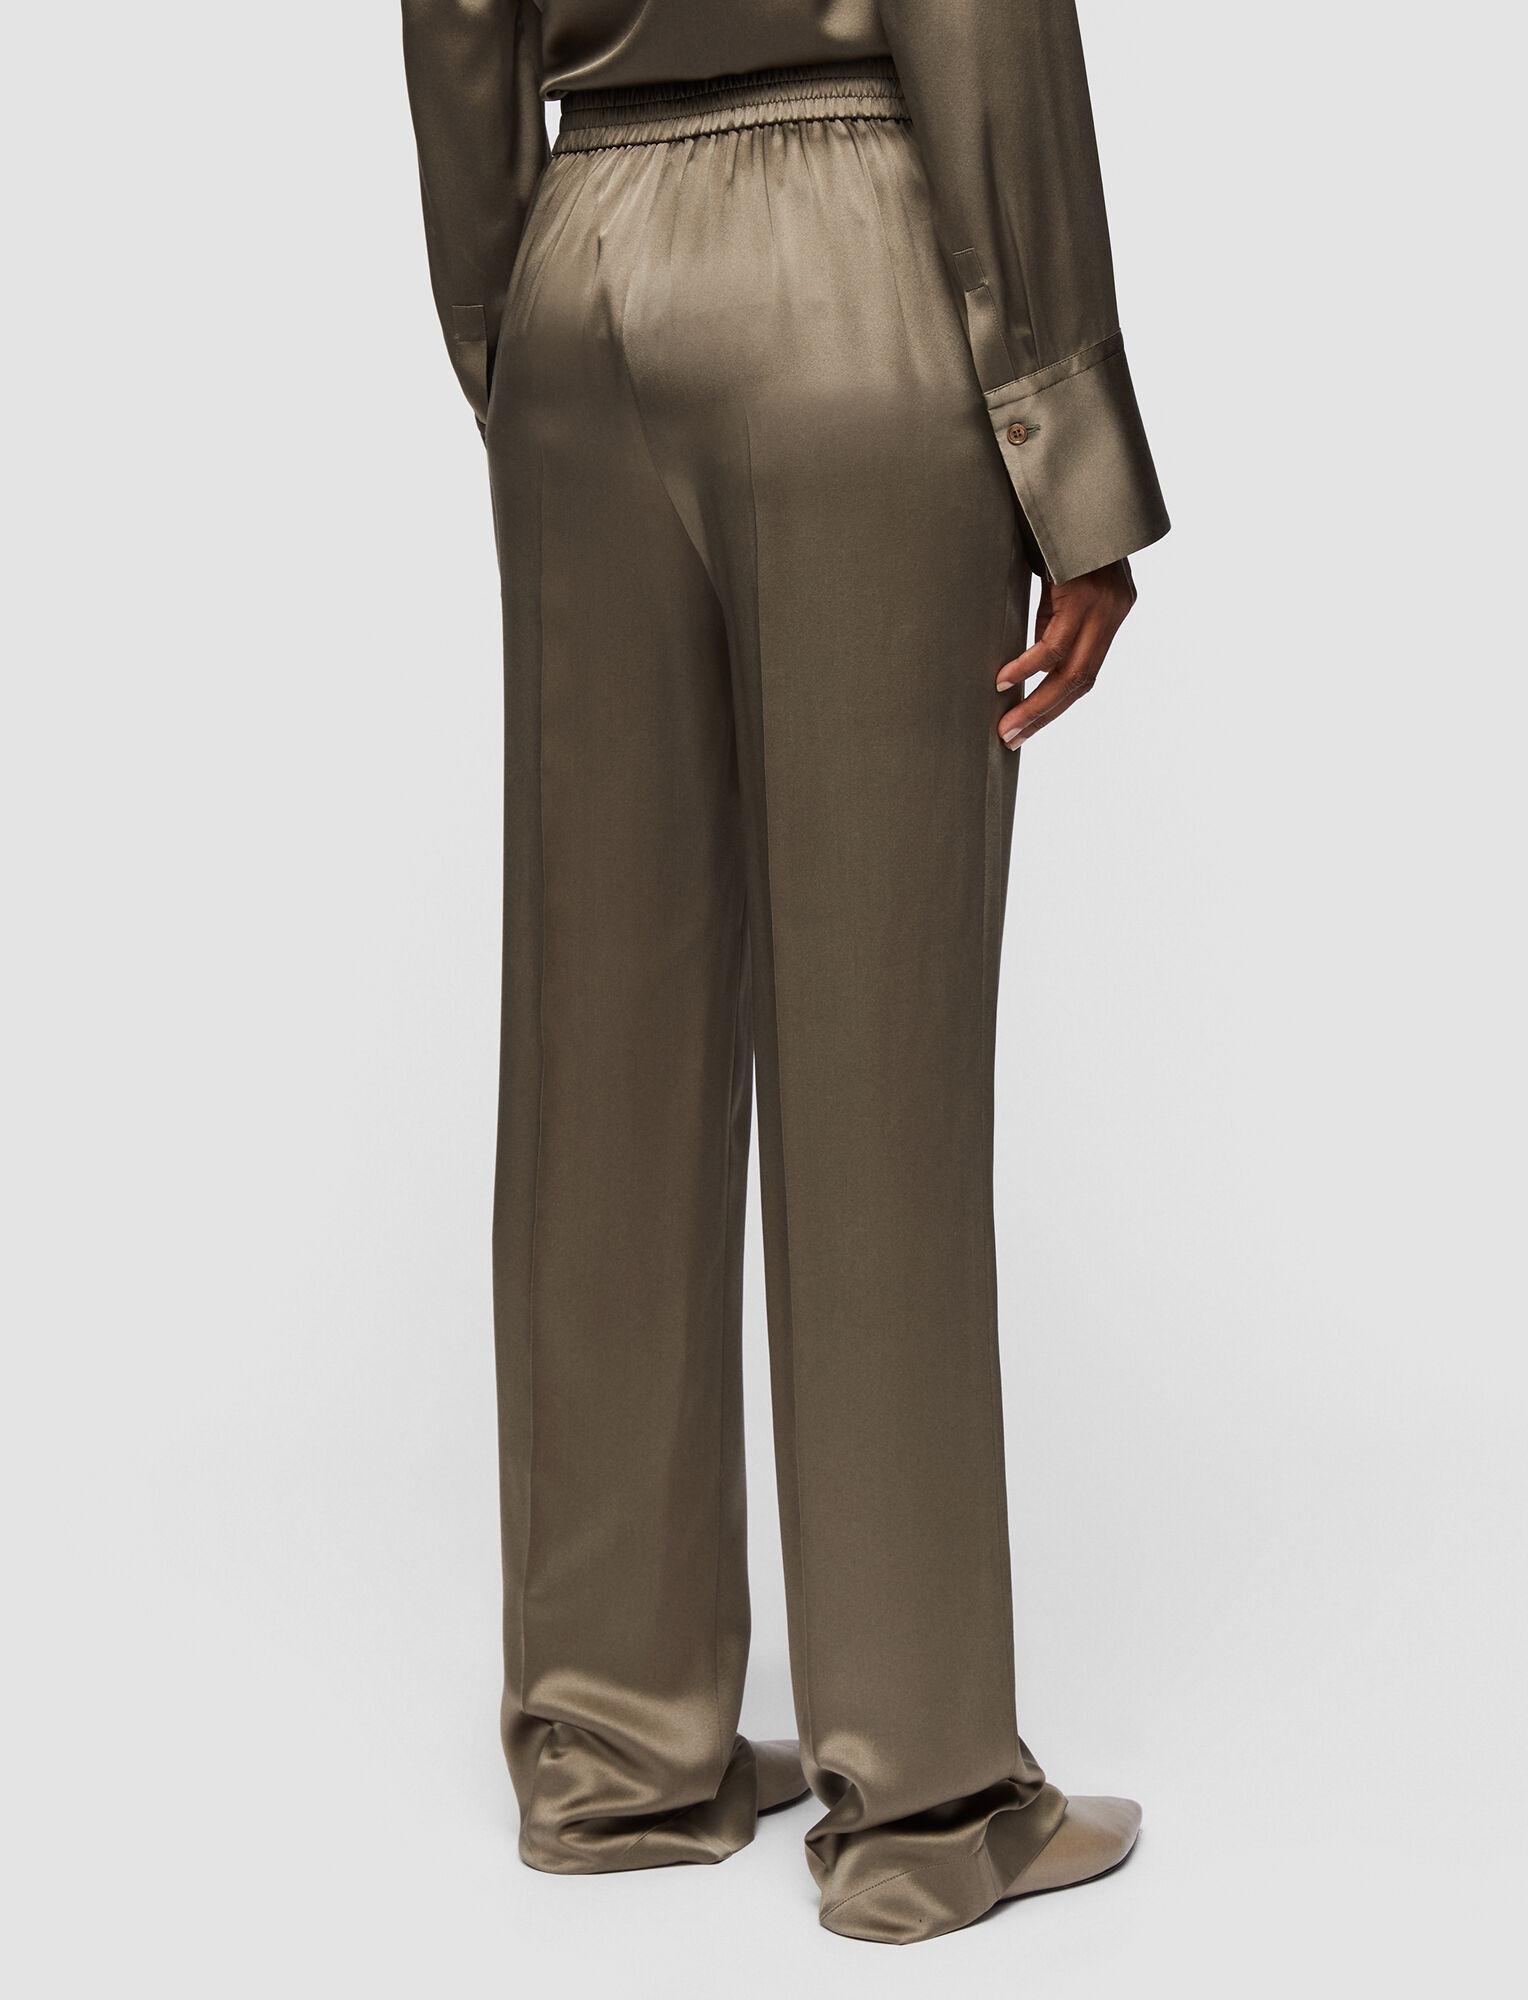 Joseph, Silk Satin Tova Trousers, in ELM